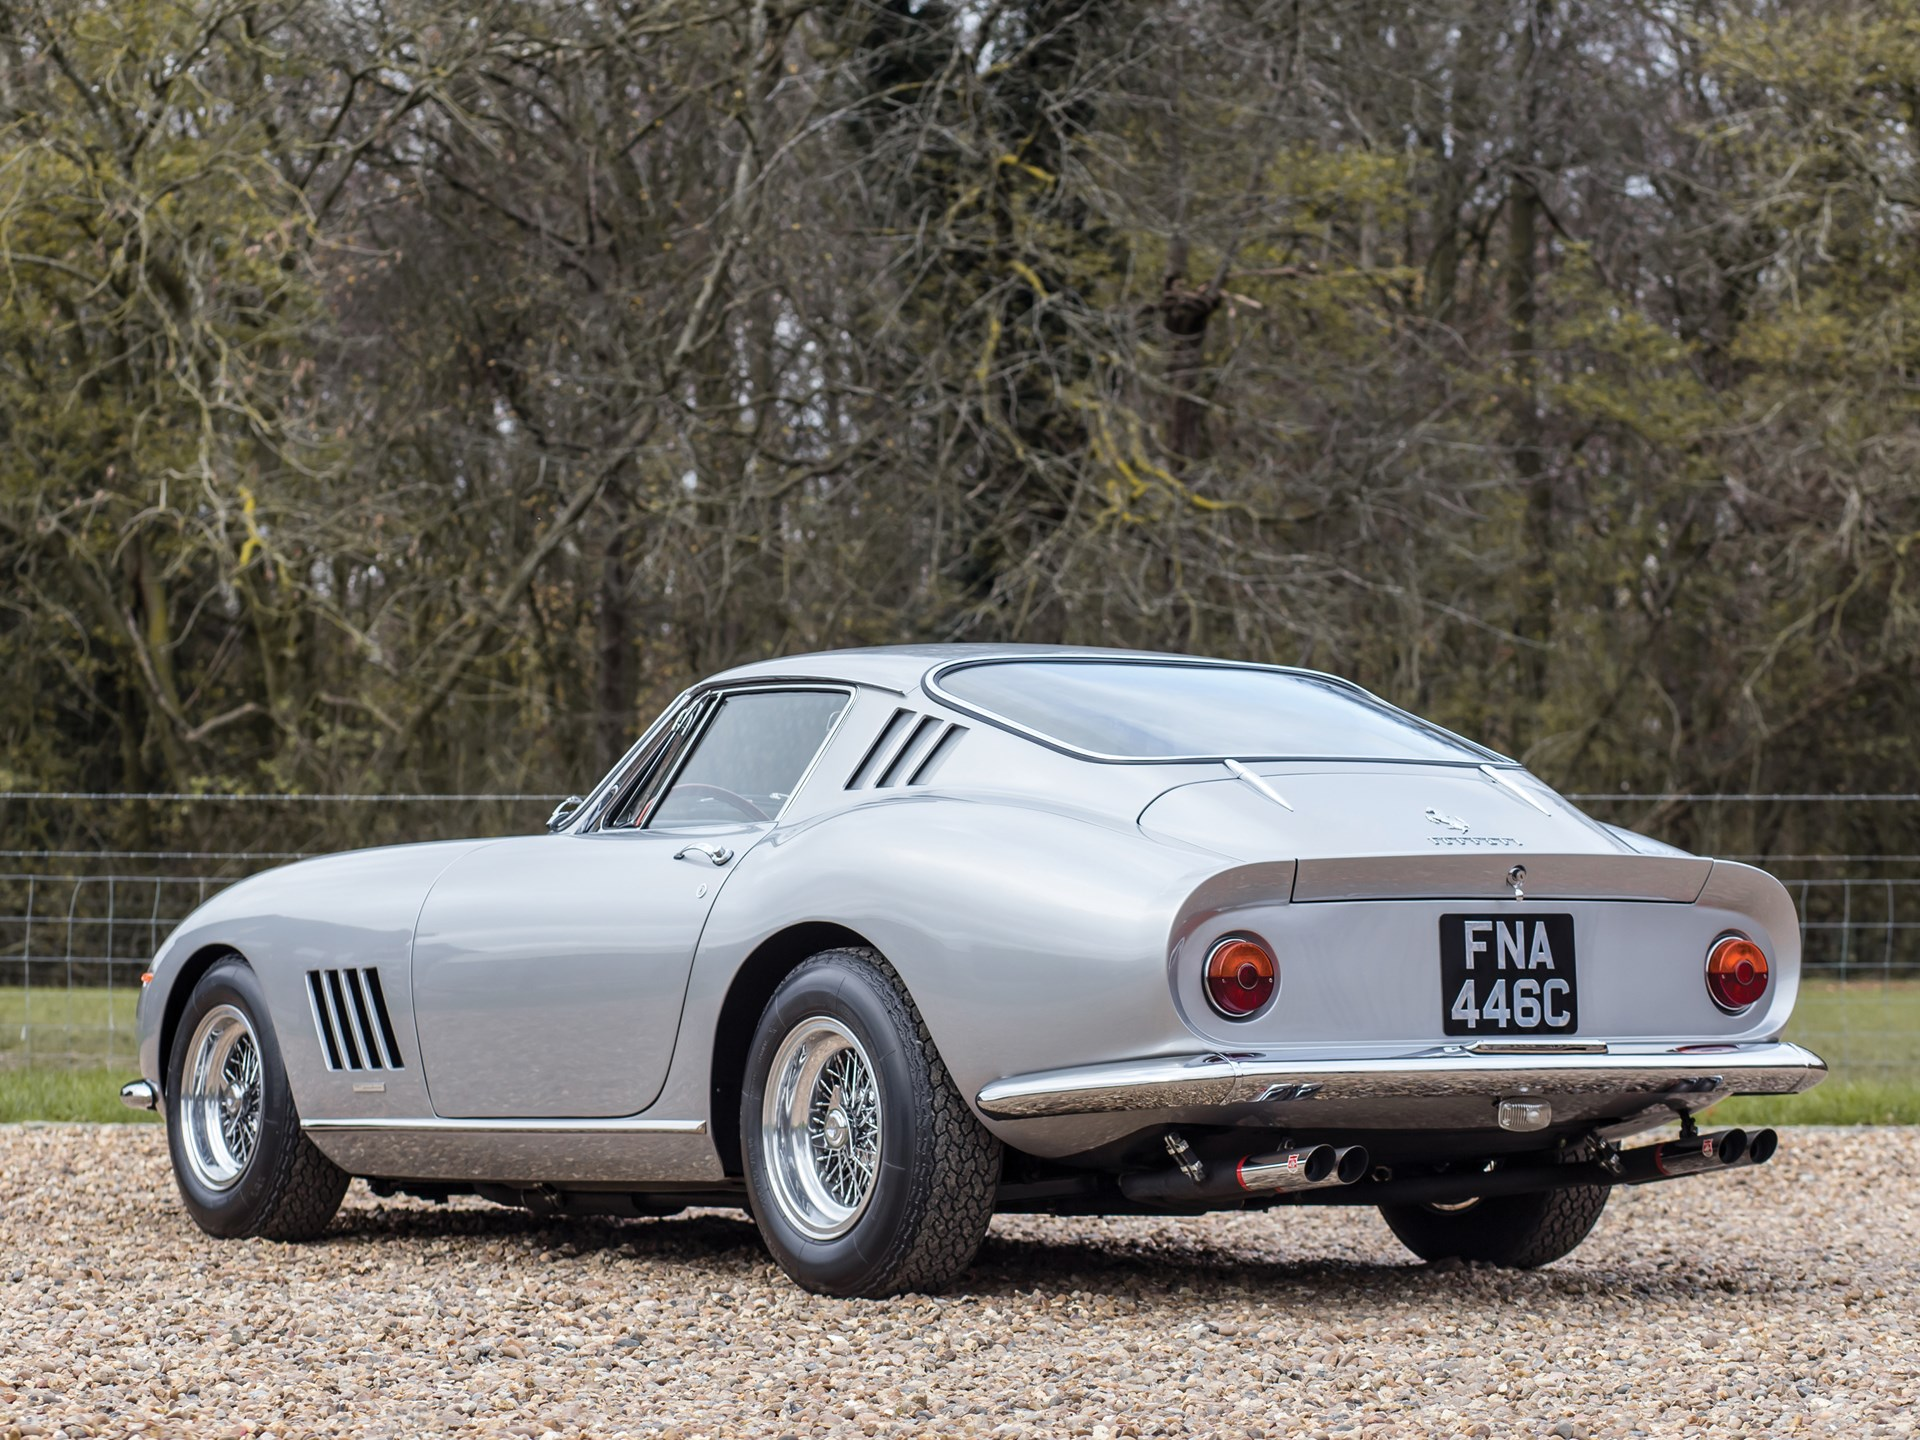 RM Sotheby's - 1965 Ferrari 275 GTB Alloy by Scaglietti ...